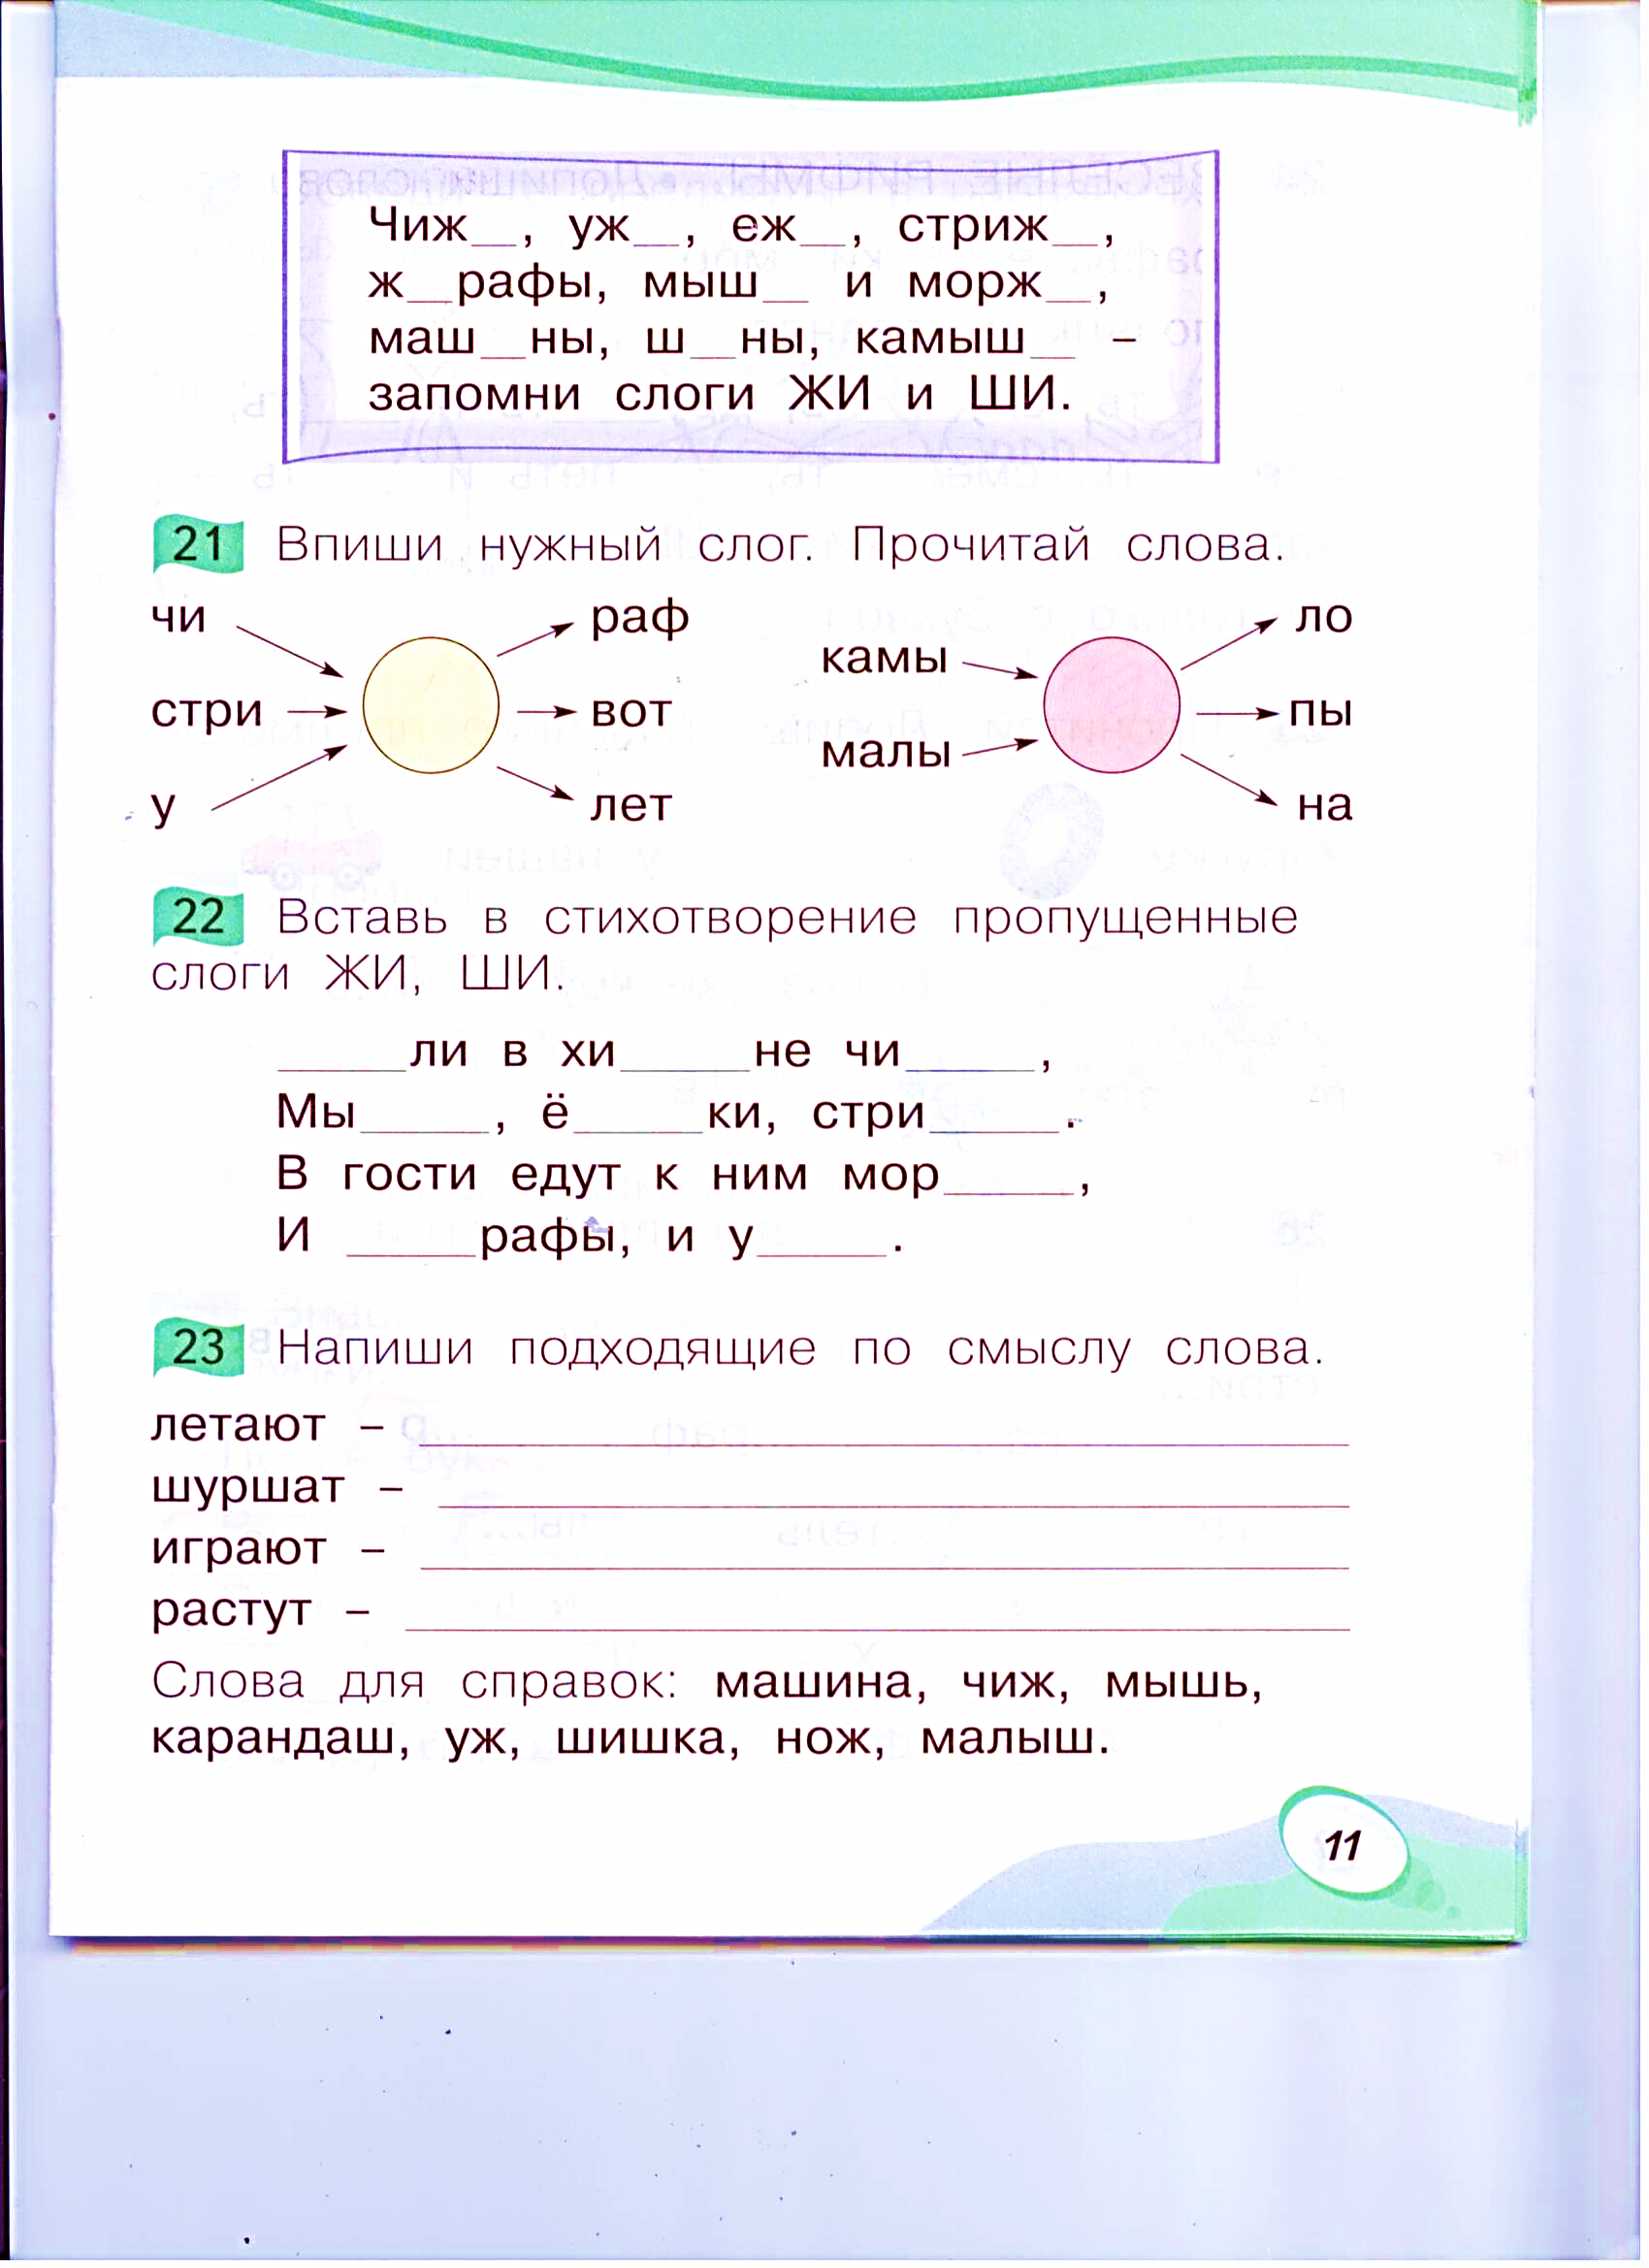 C:\Users\Рангулова\Pictures\2015-12-21 1\1 004.jpg